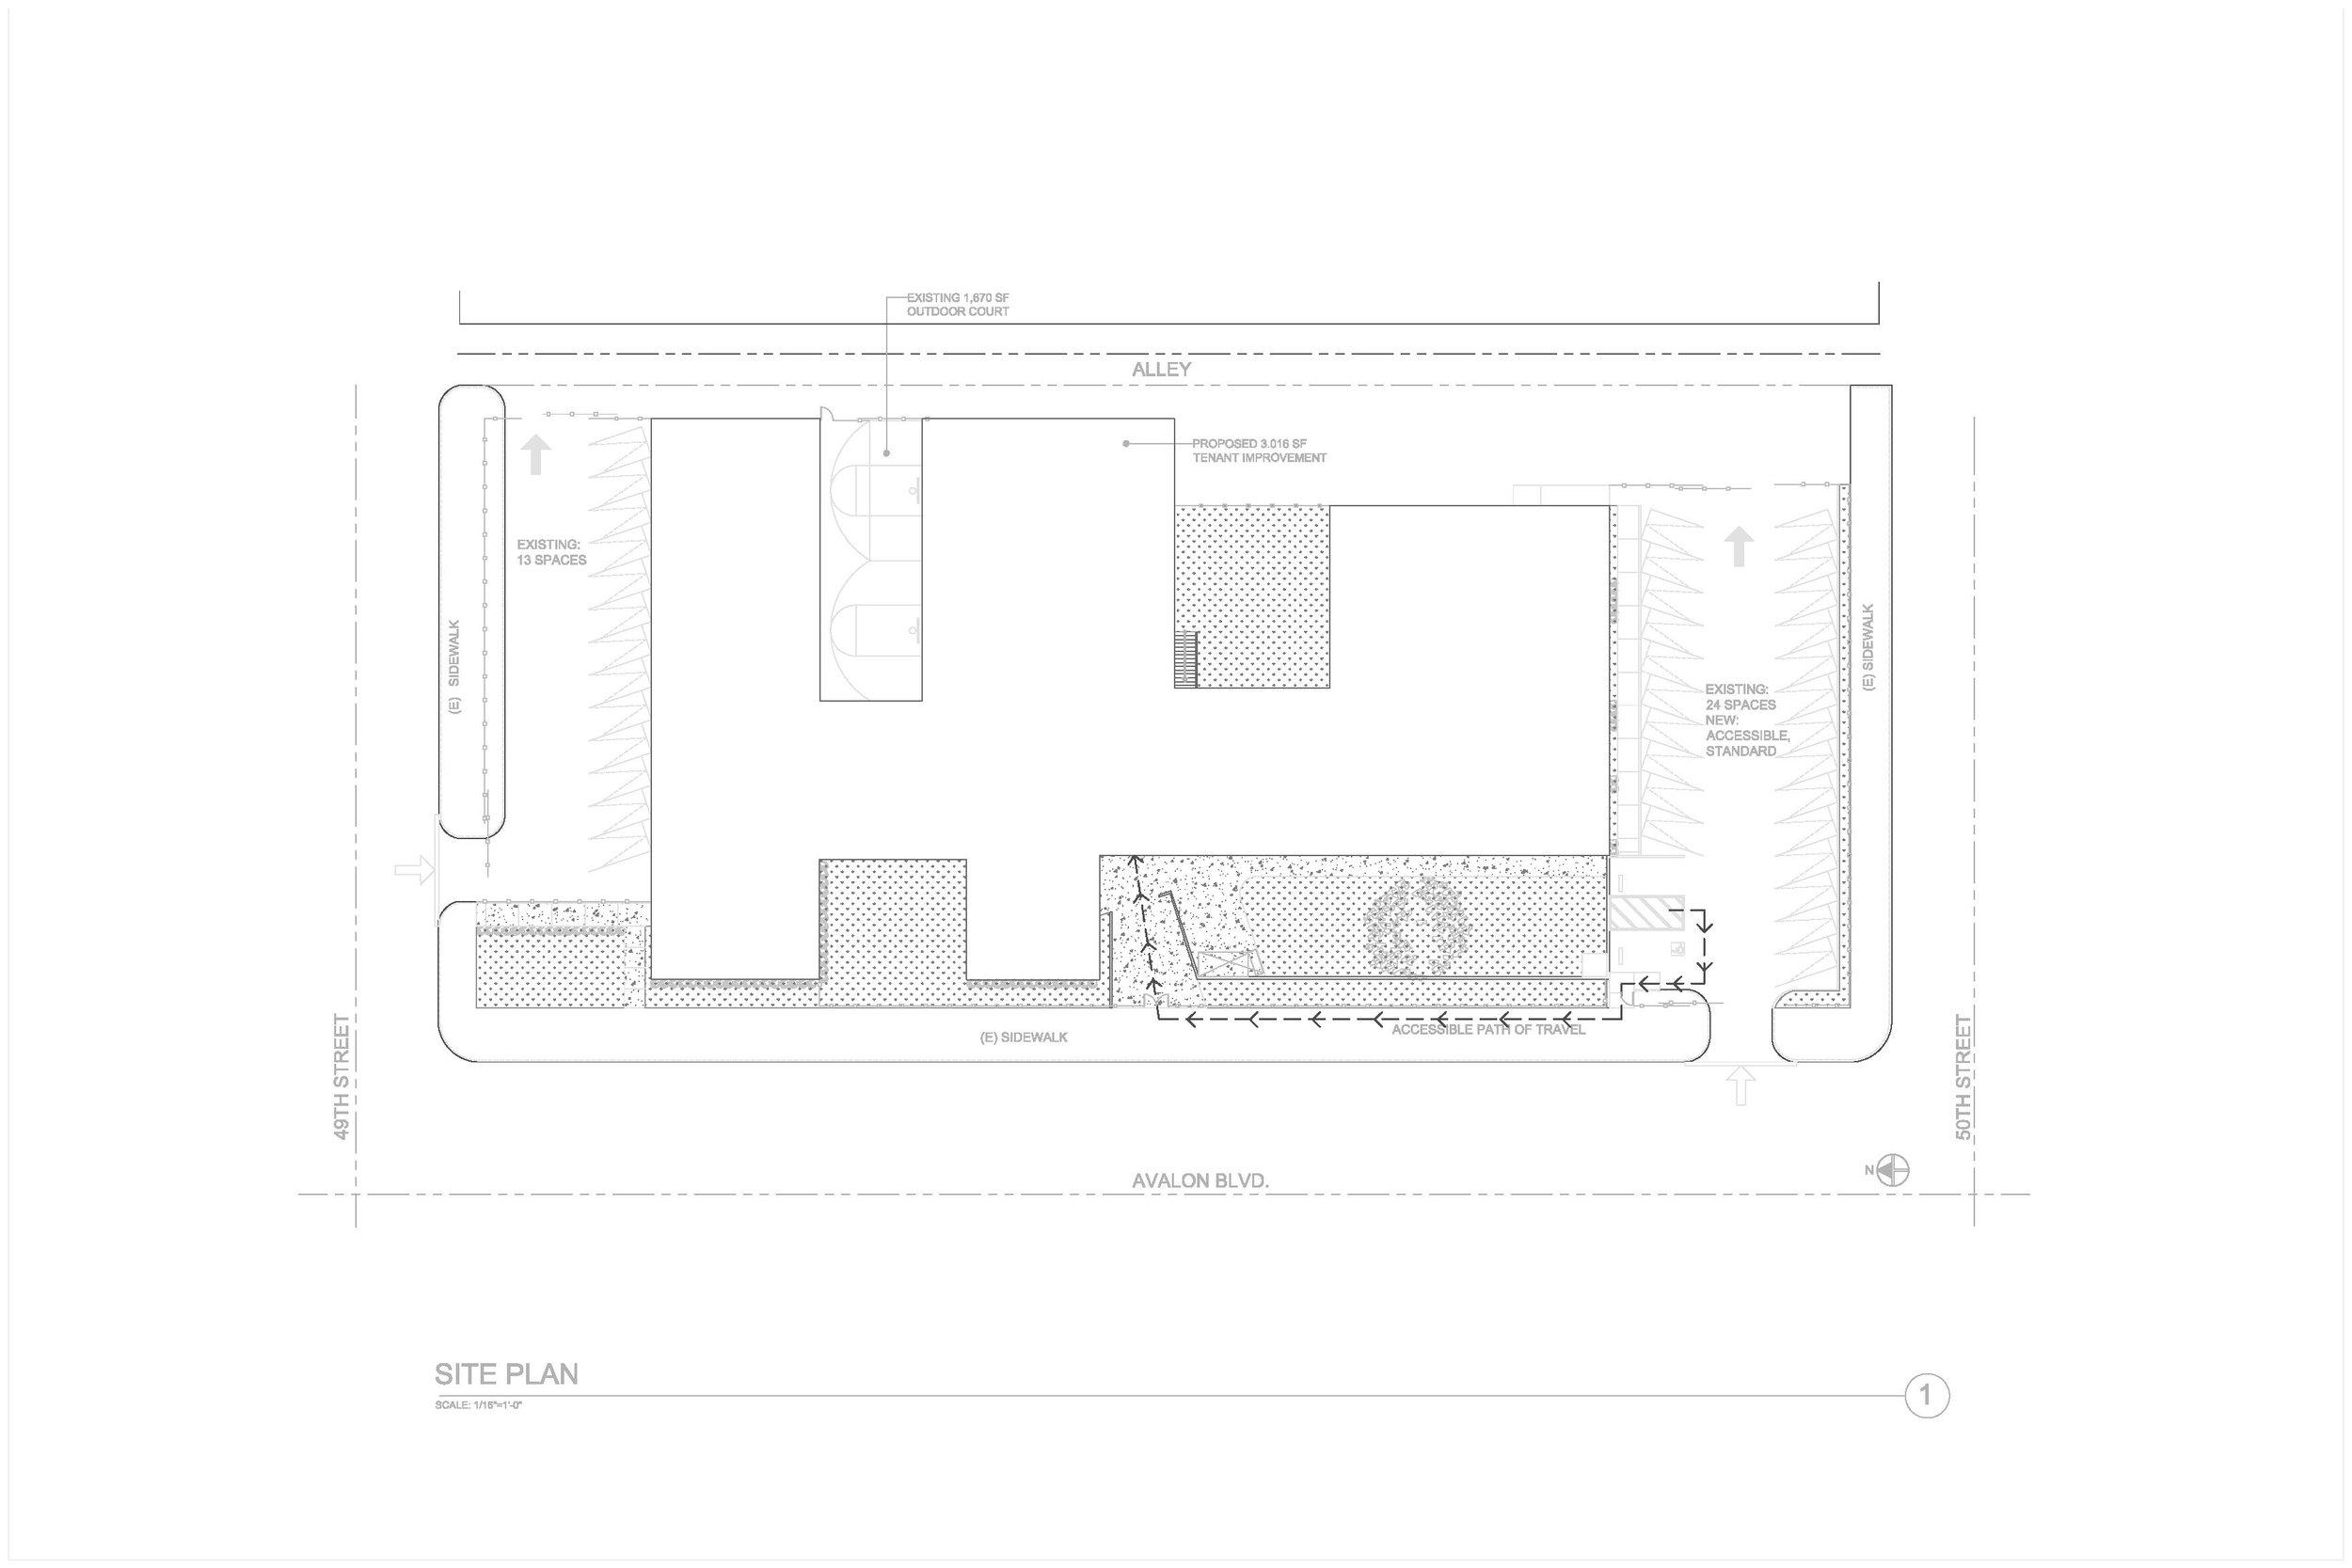 Copy of AC_Site Plan 24X36.jpg